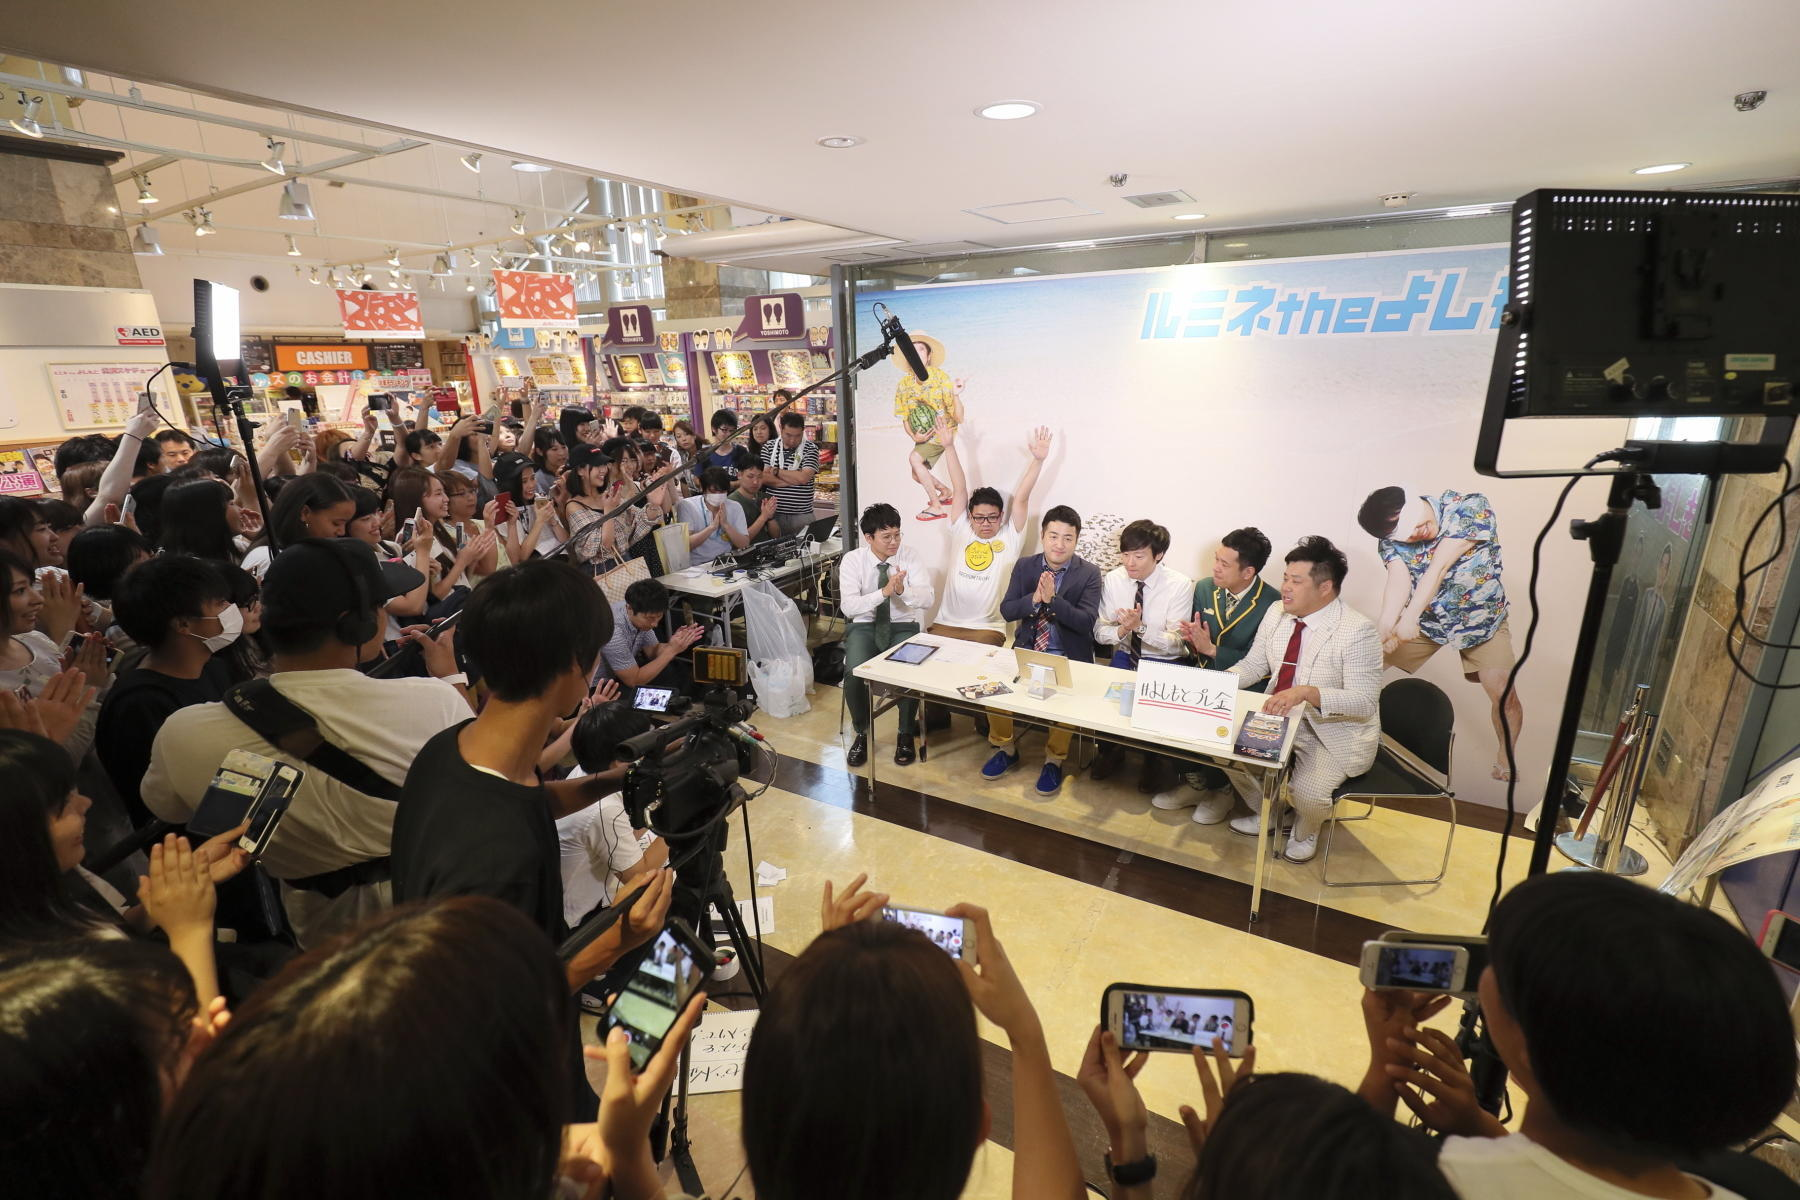 http://news.yoshimoto.co.jp/20180727224446-240648ea0d4f8d20aa2c41f22cb33d9eb7c68f2b.jpg